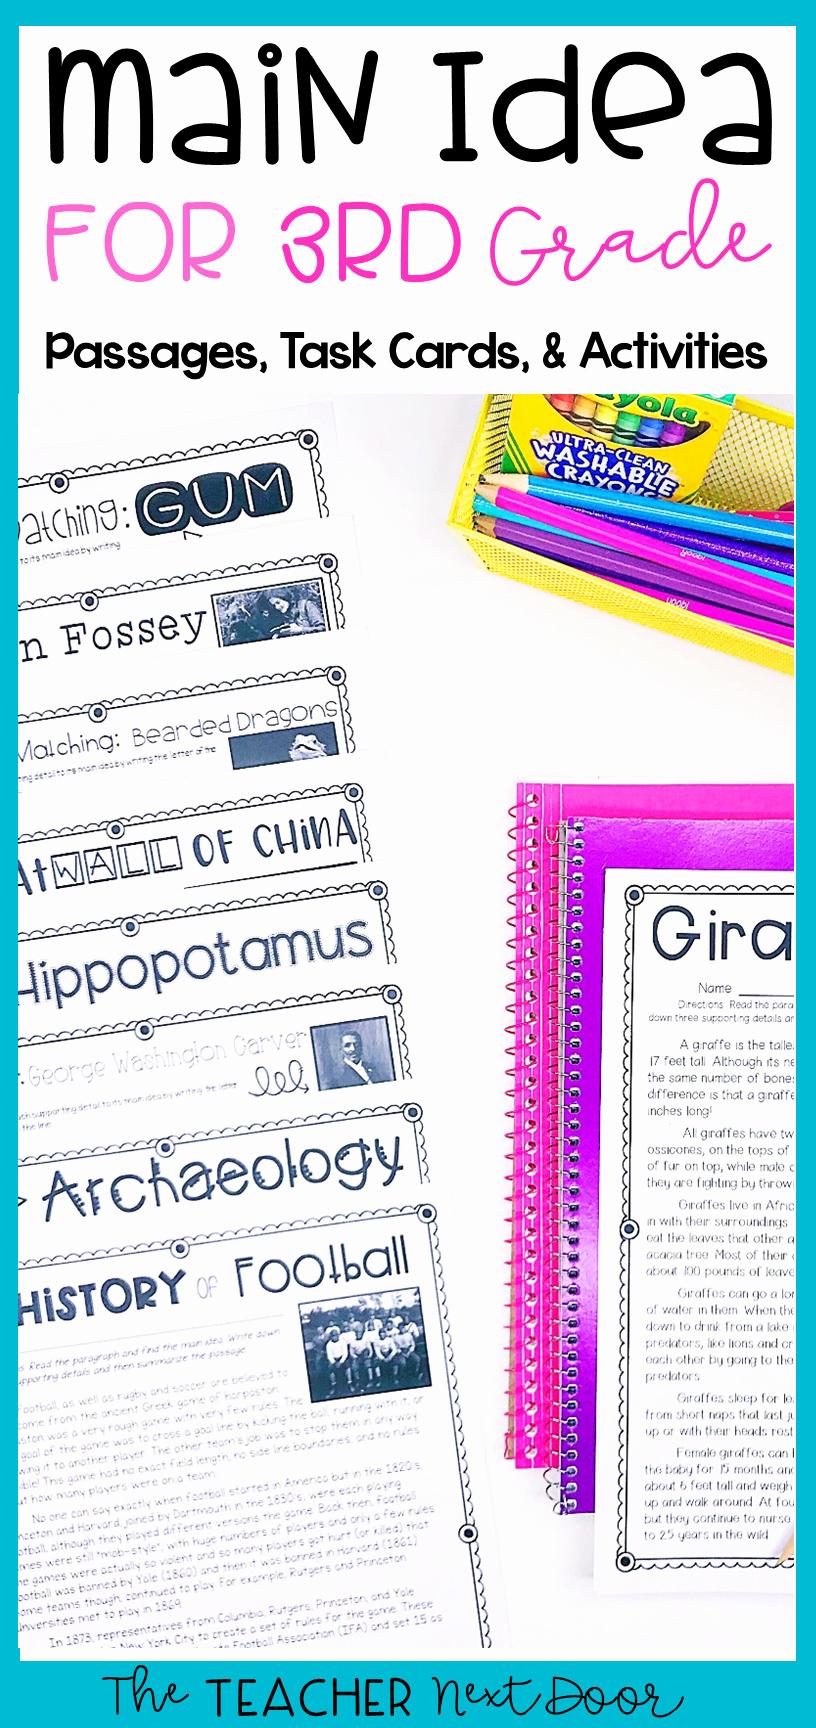 3rd Grade Main Idea Worksheets Beautiful Main Idea for 3rd Grade